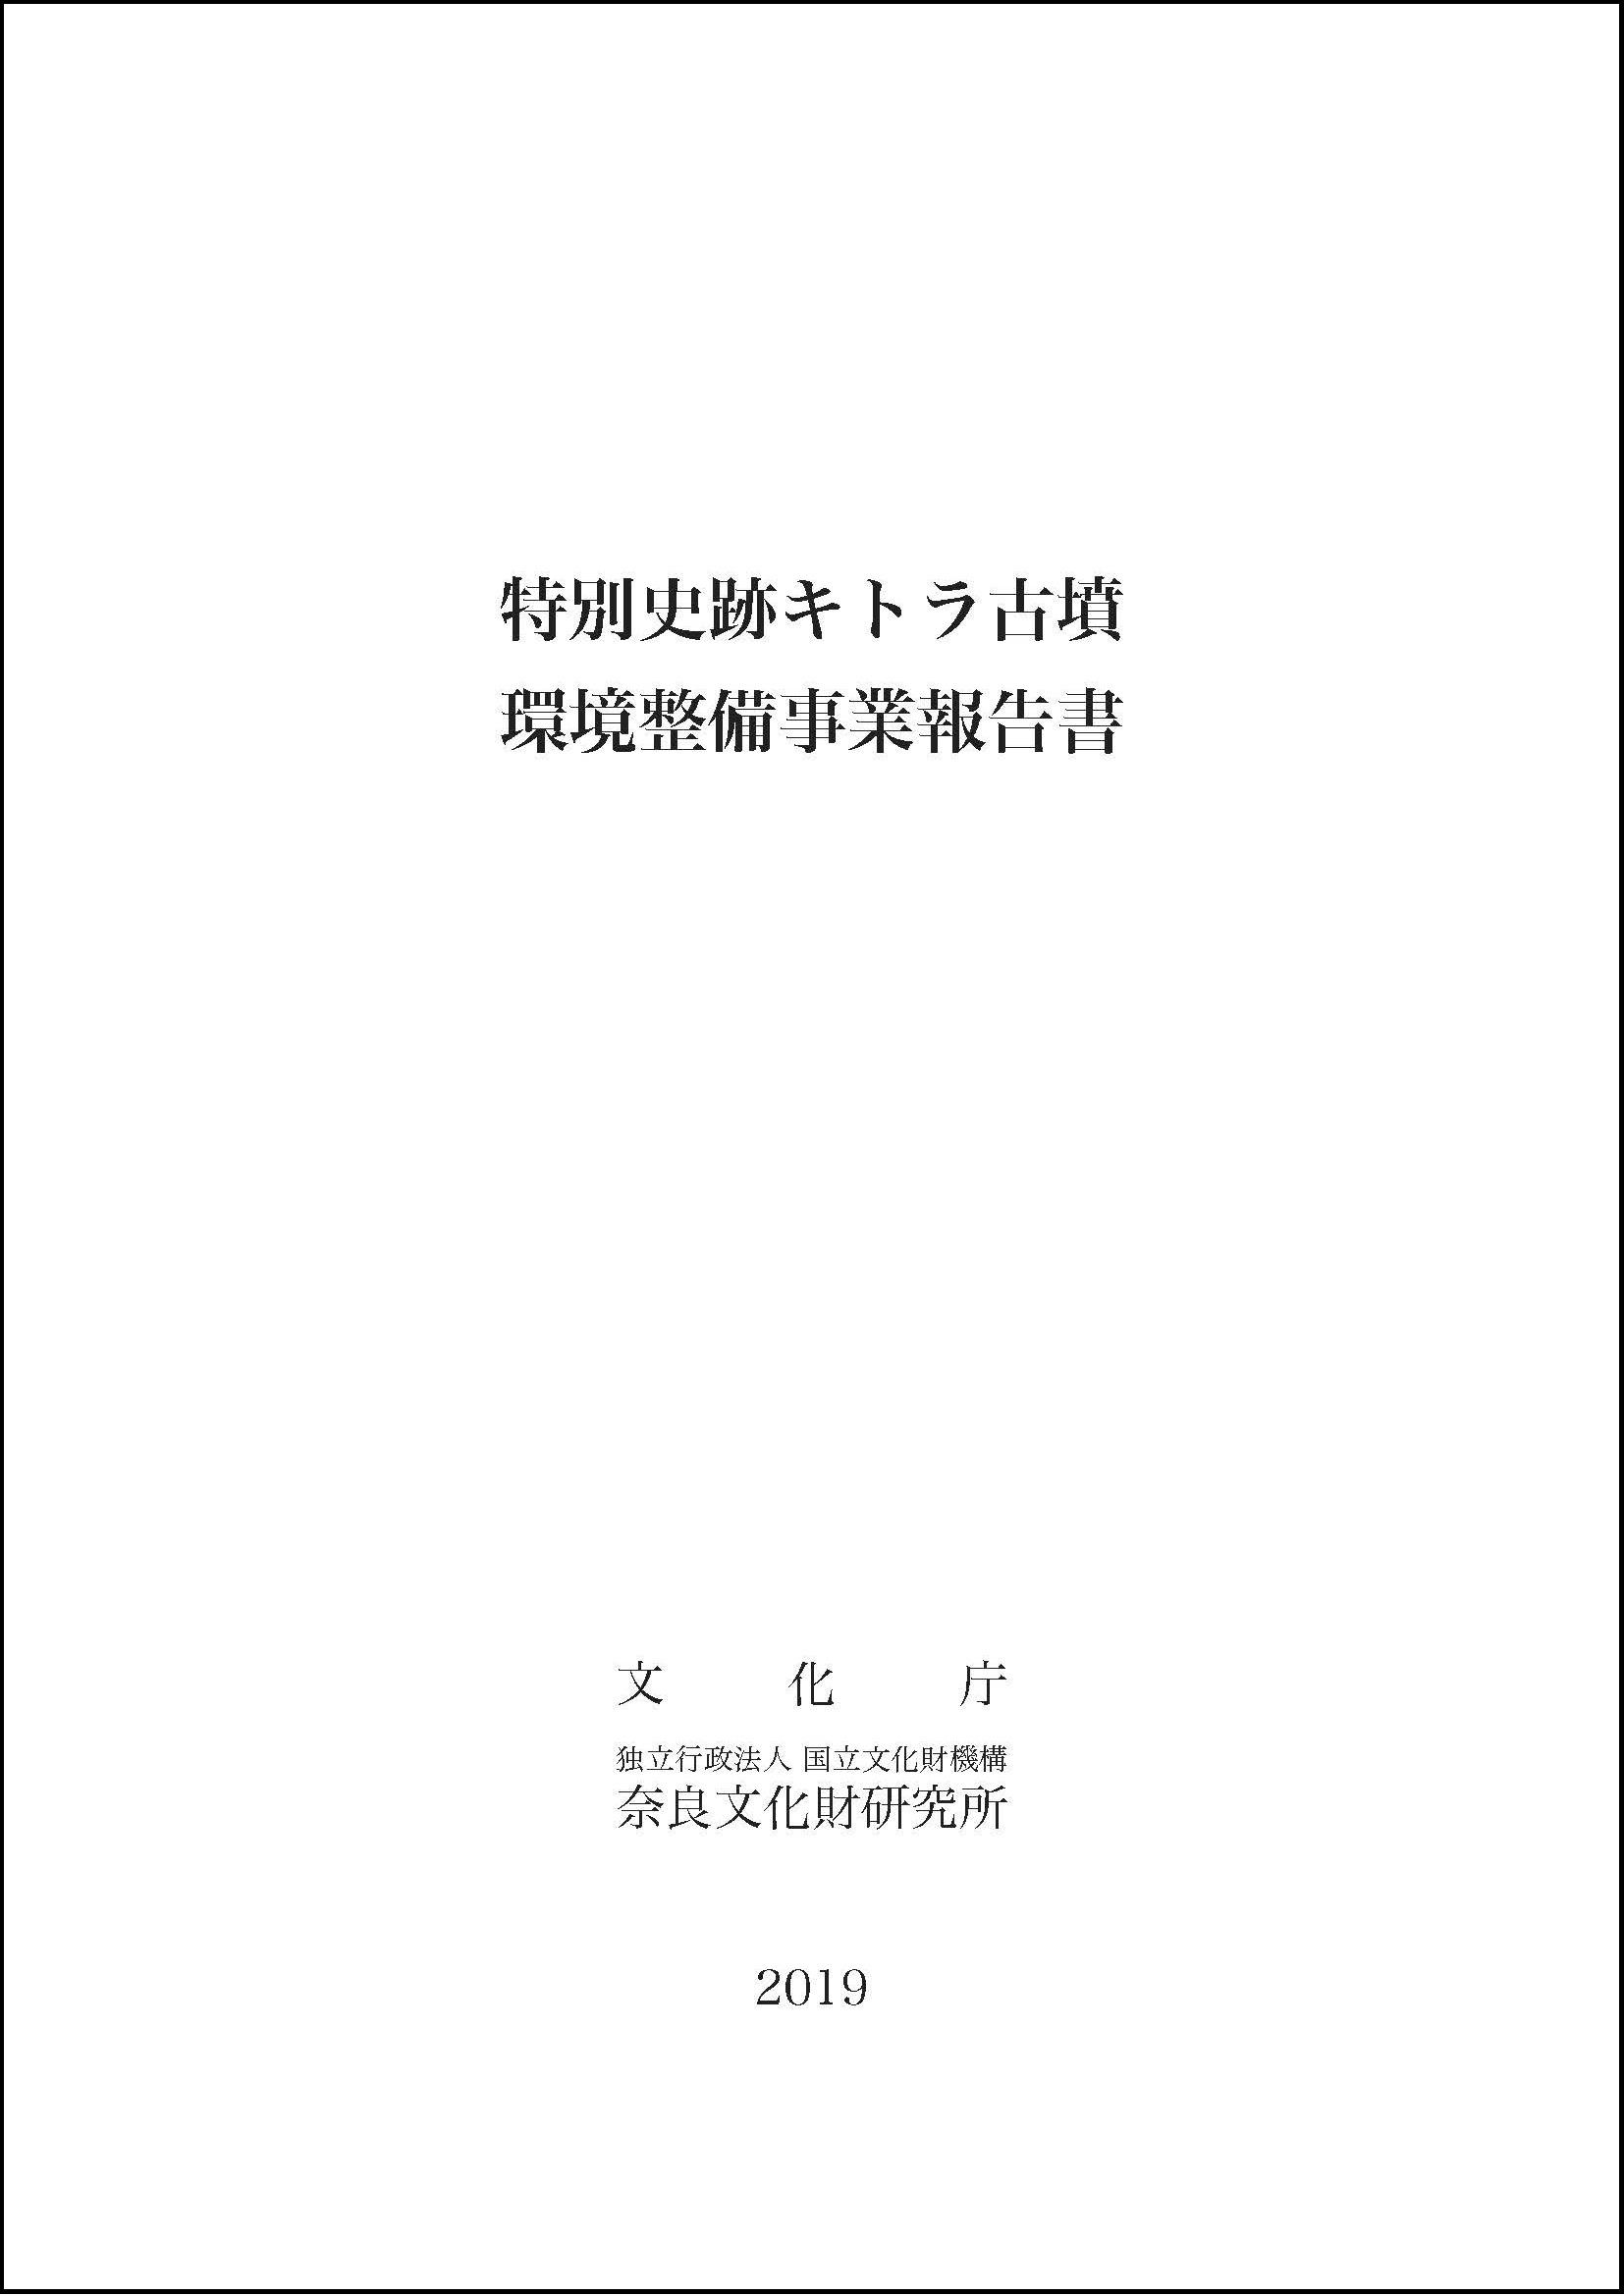 BB28402395_hyoushi.jpg